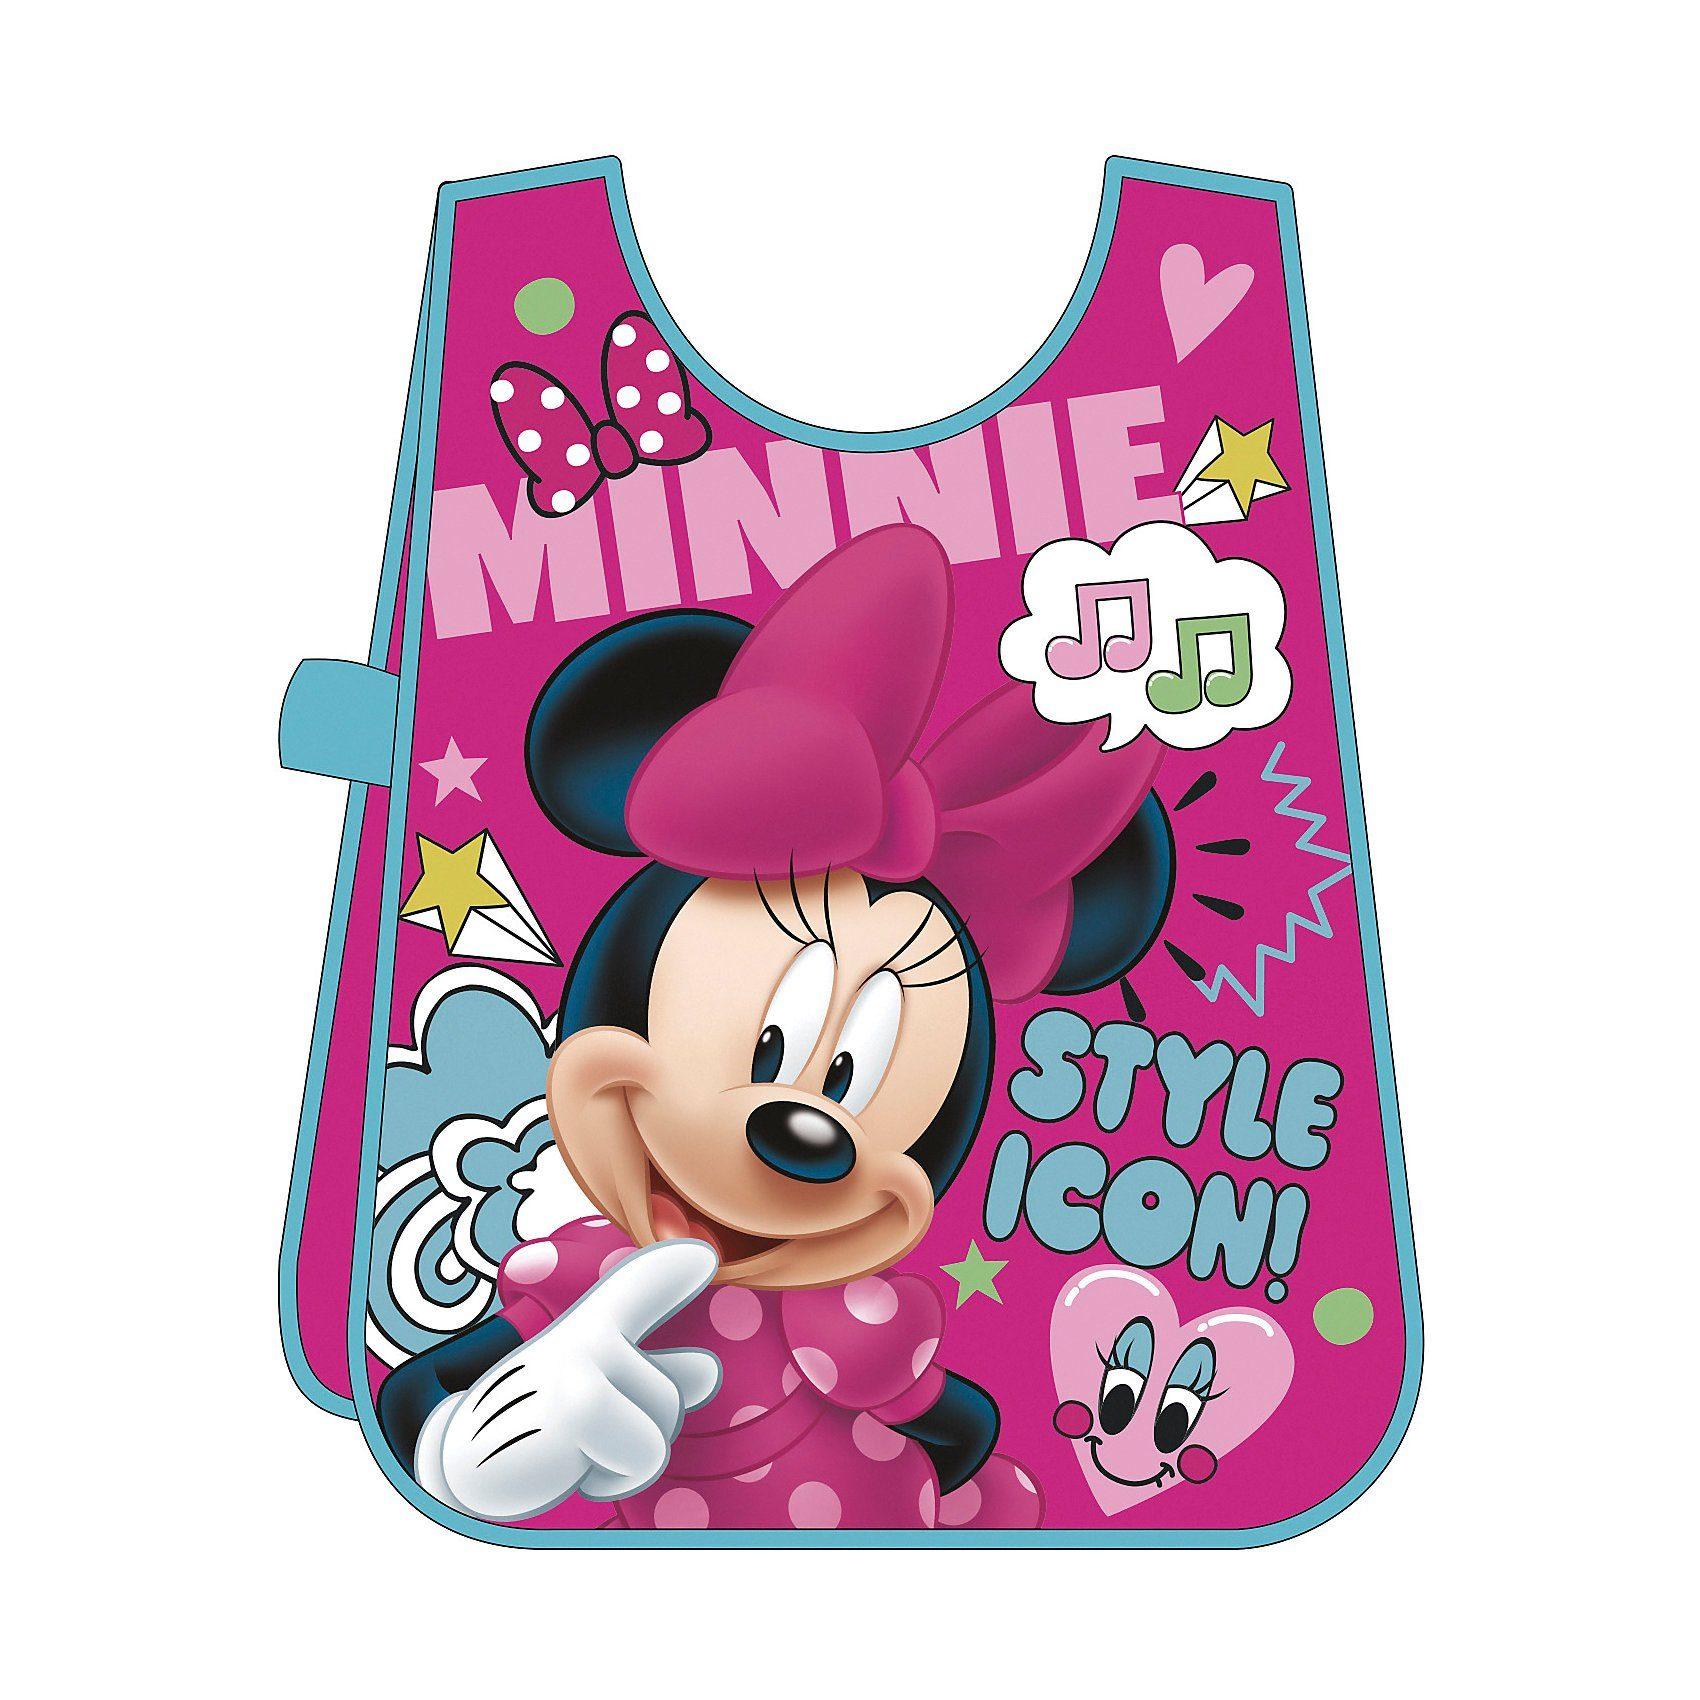 AUSL Malschürze Minnie Mouse